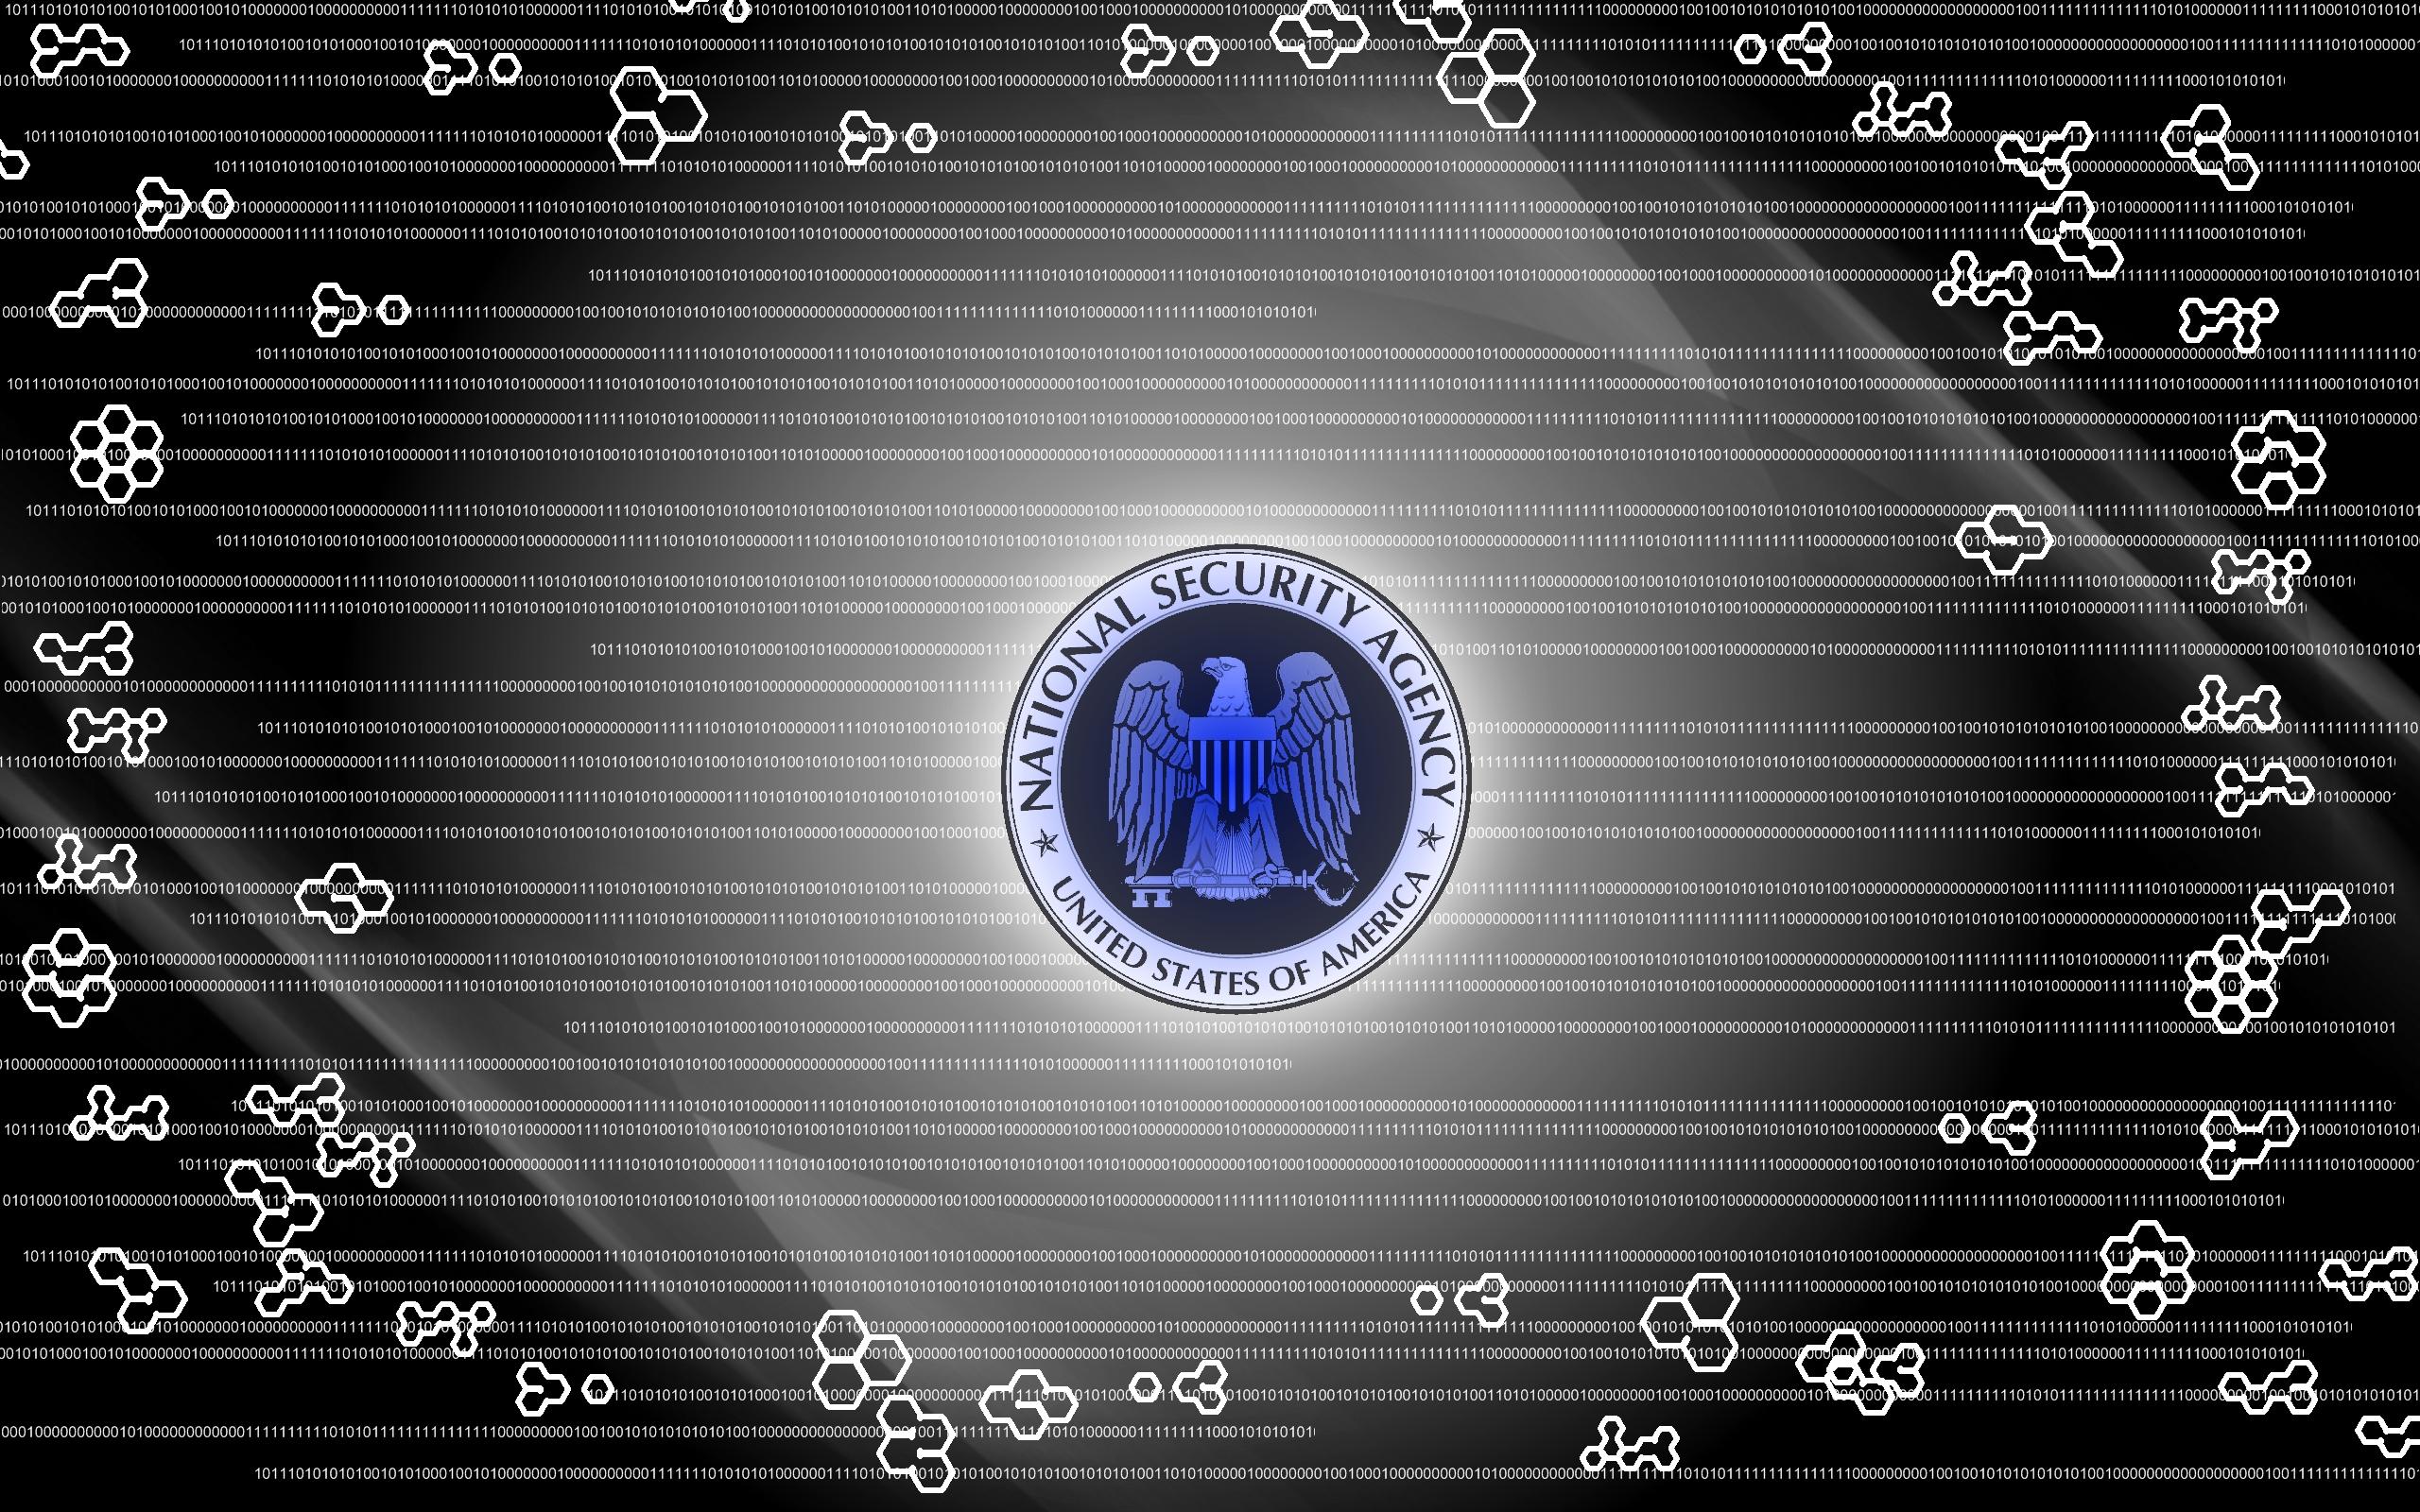 Inspirational Quotes Computer Wallpaper National Security Agency Wallpaper Hd Pixelstalk Net